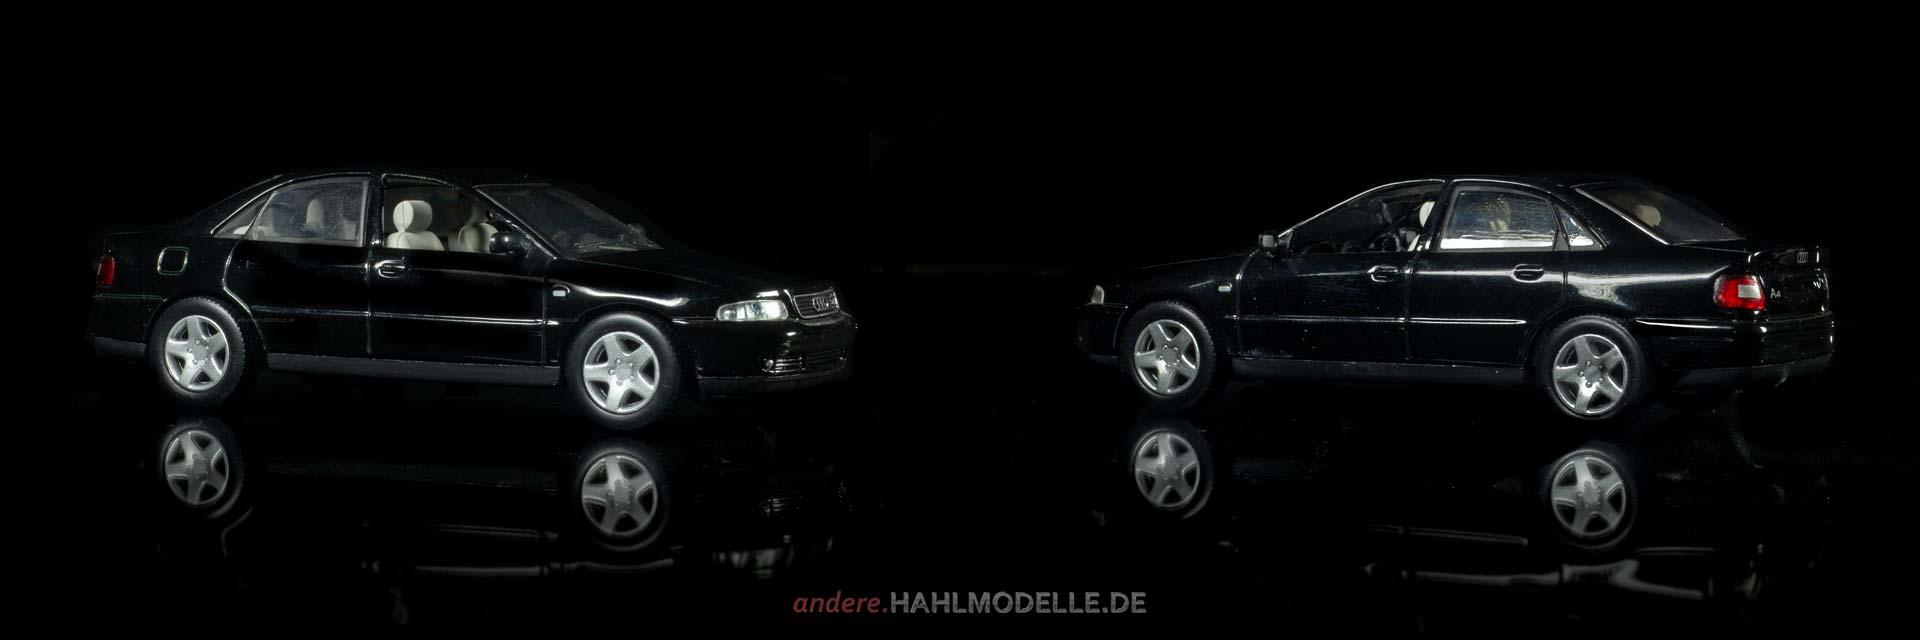 Audi A4 B6 | Limousine | Ixo | www.andere.hahlmodelle.de